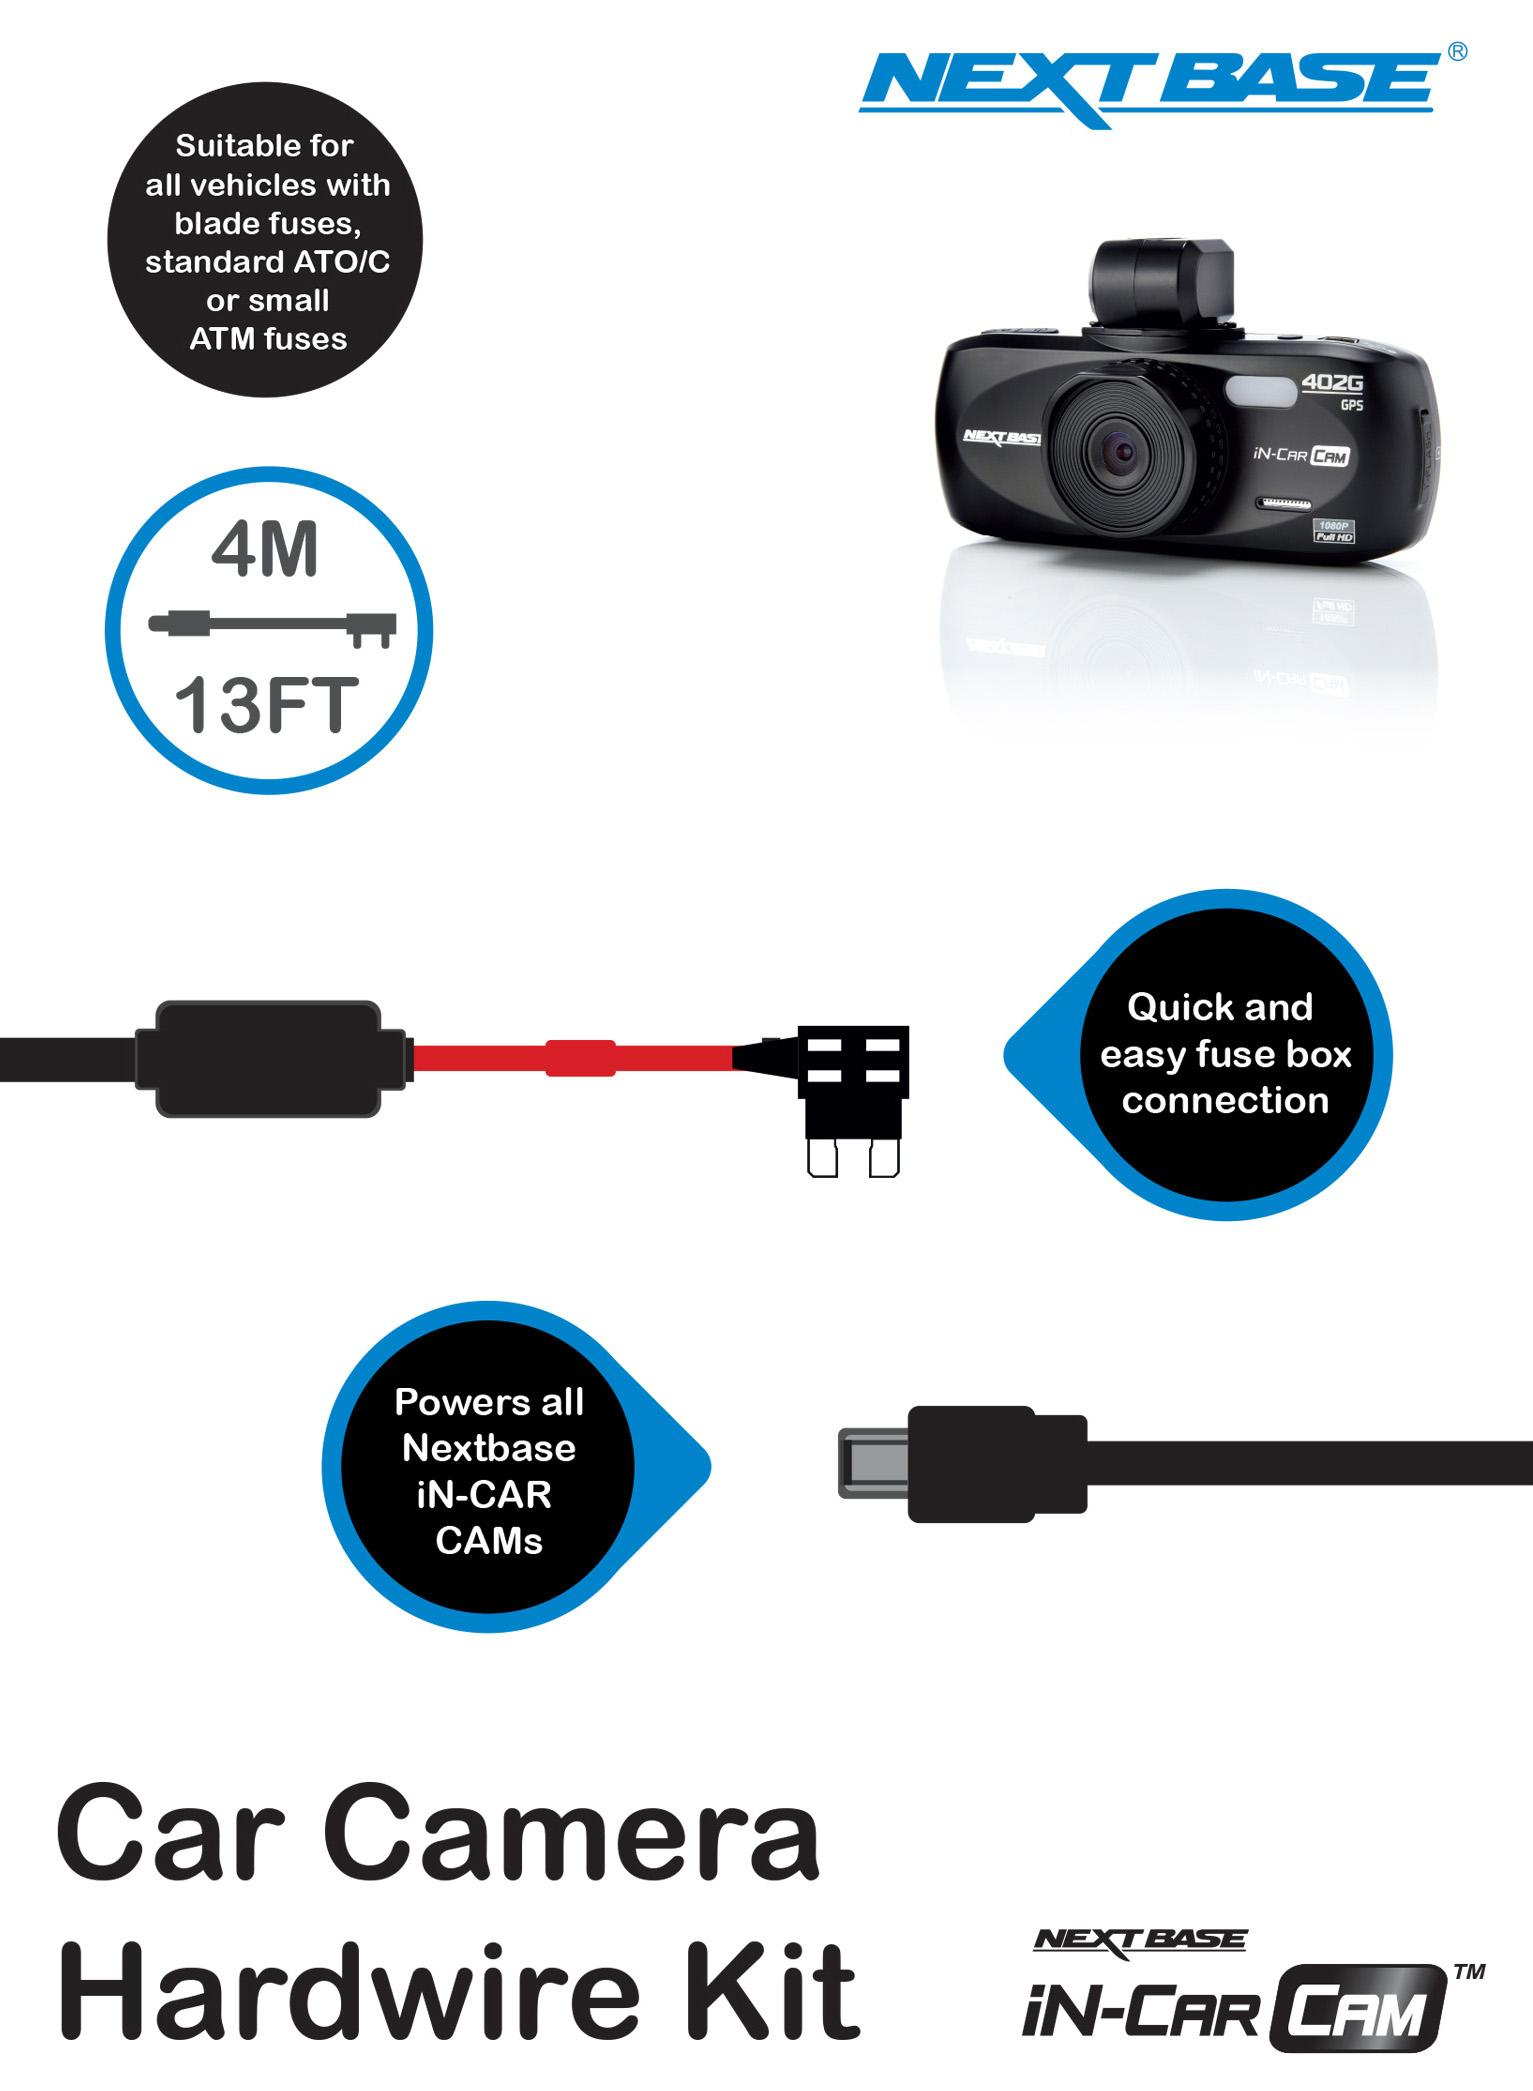 155360?w=637&h=403 dash cam hardwire kit dash cam fuse box at panicattacktreatment.co